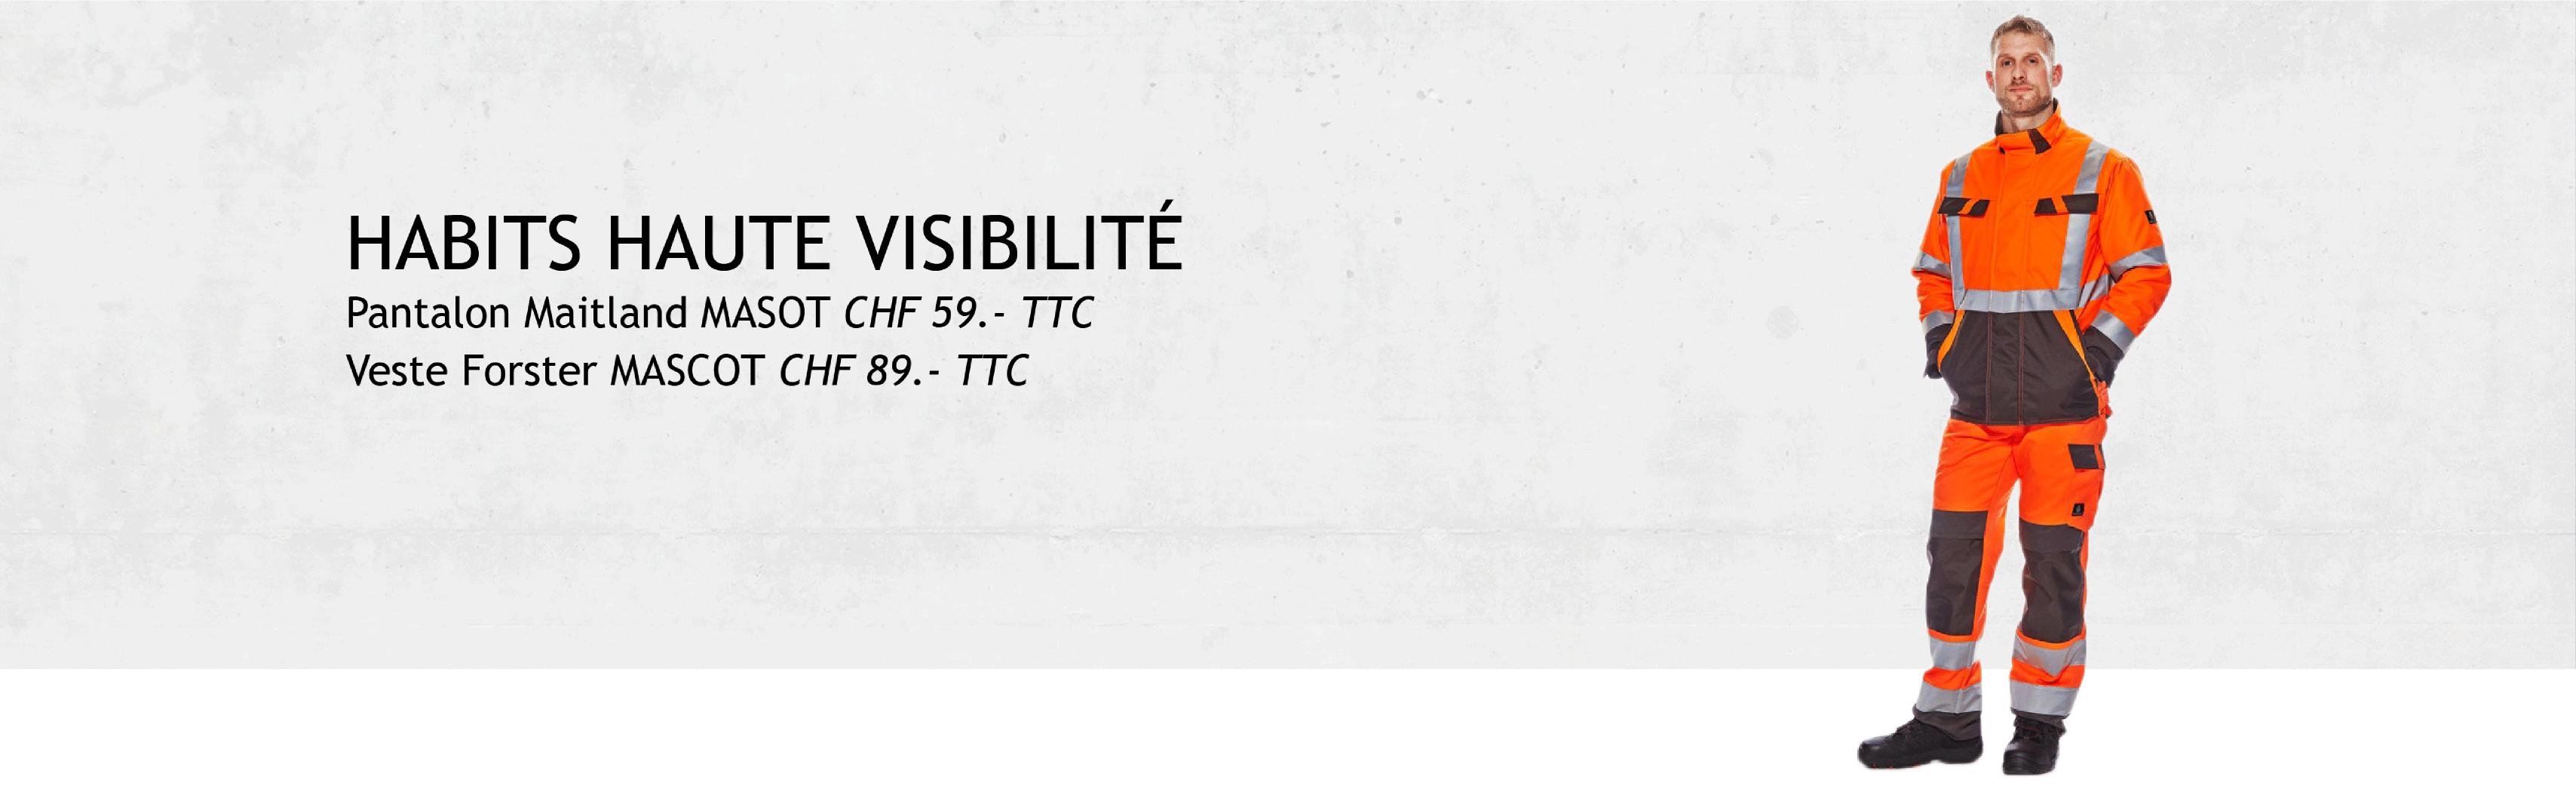 slide_habitshautevisibilite